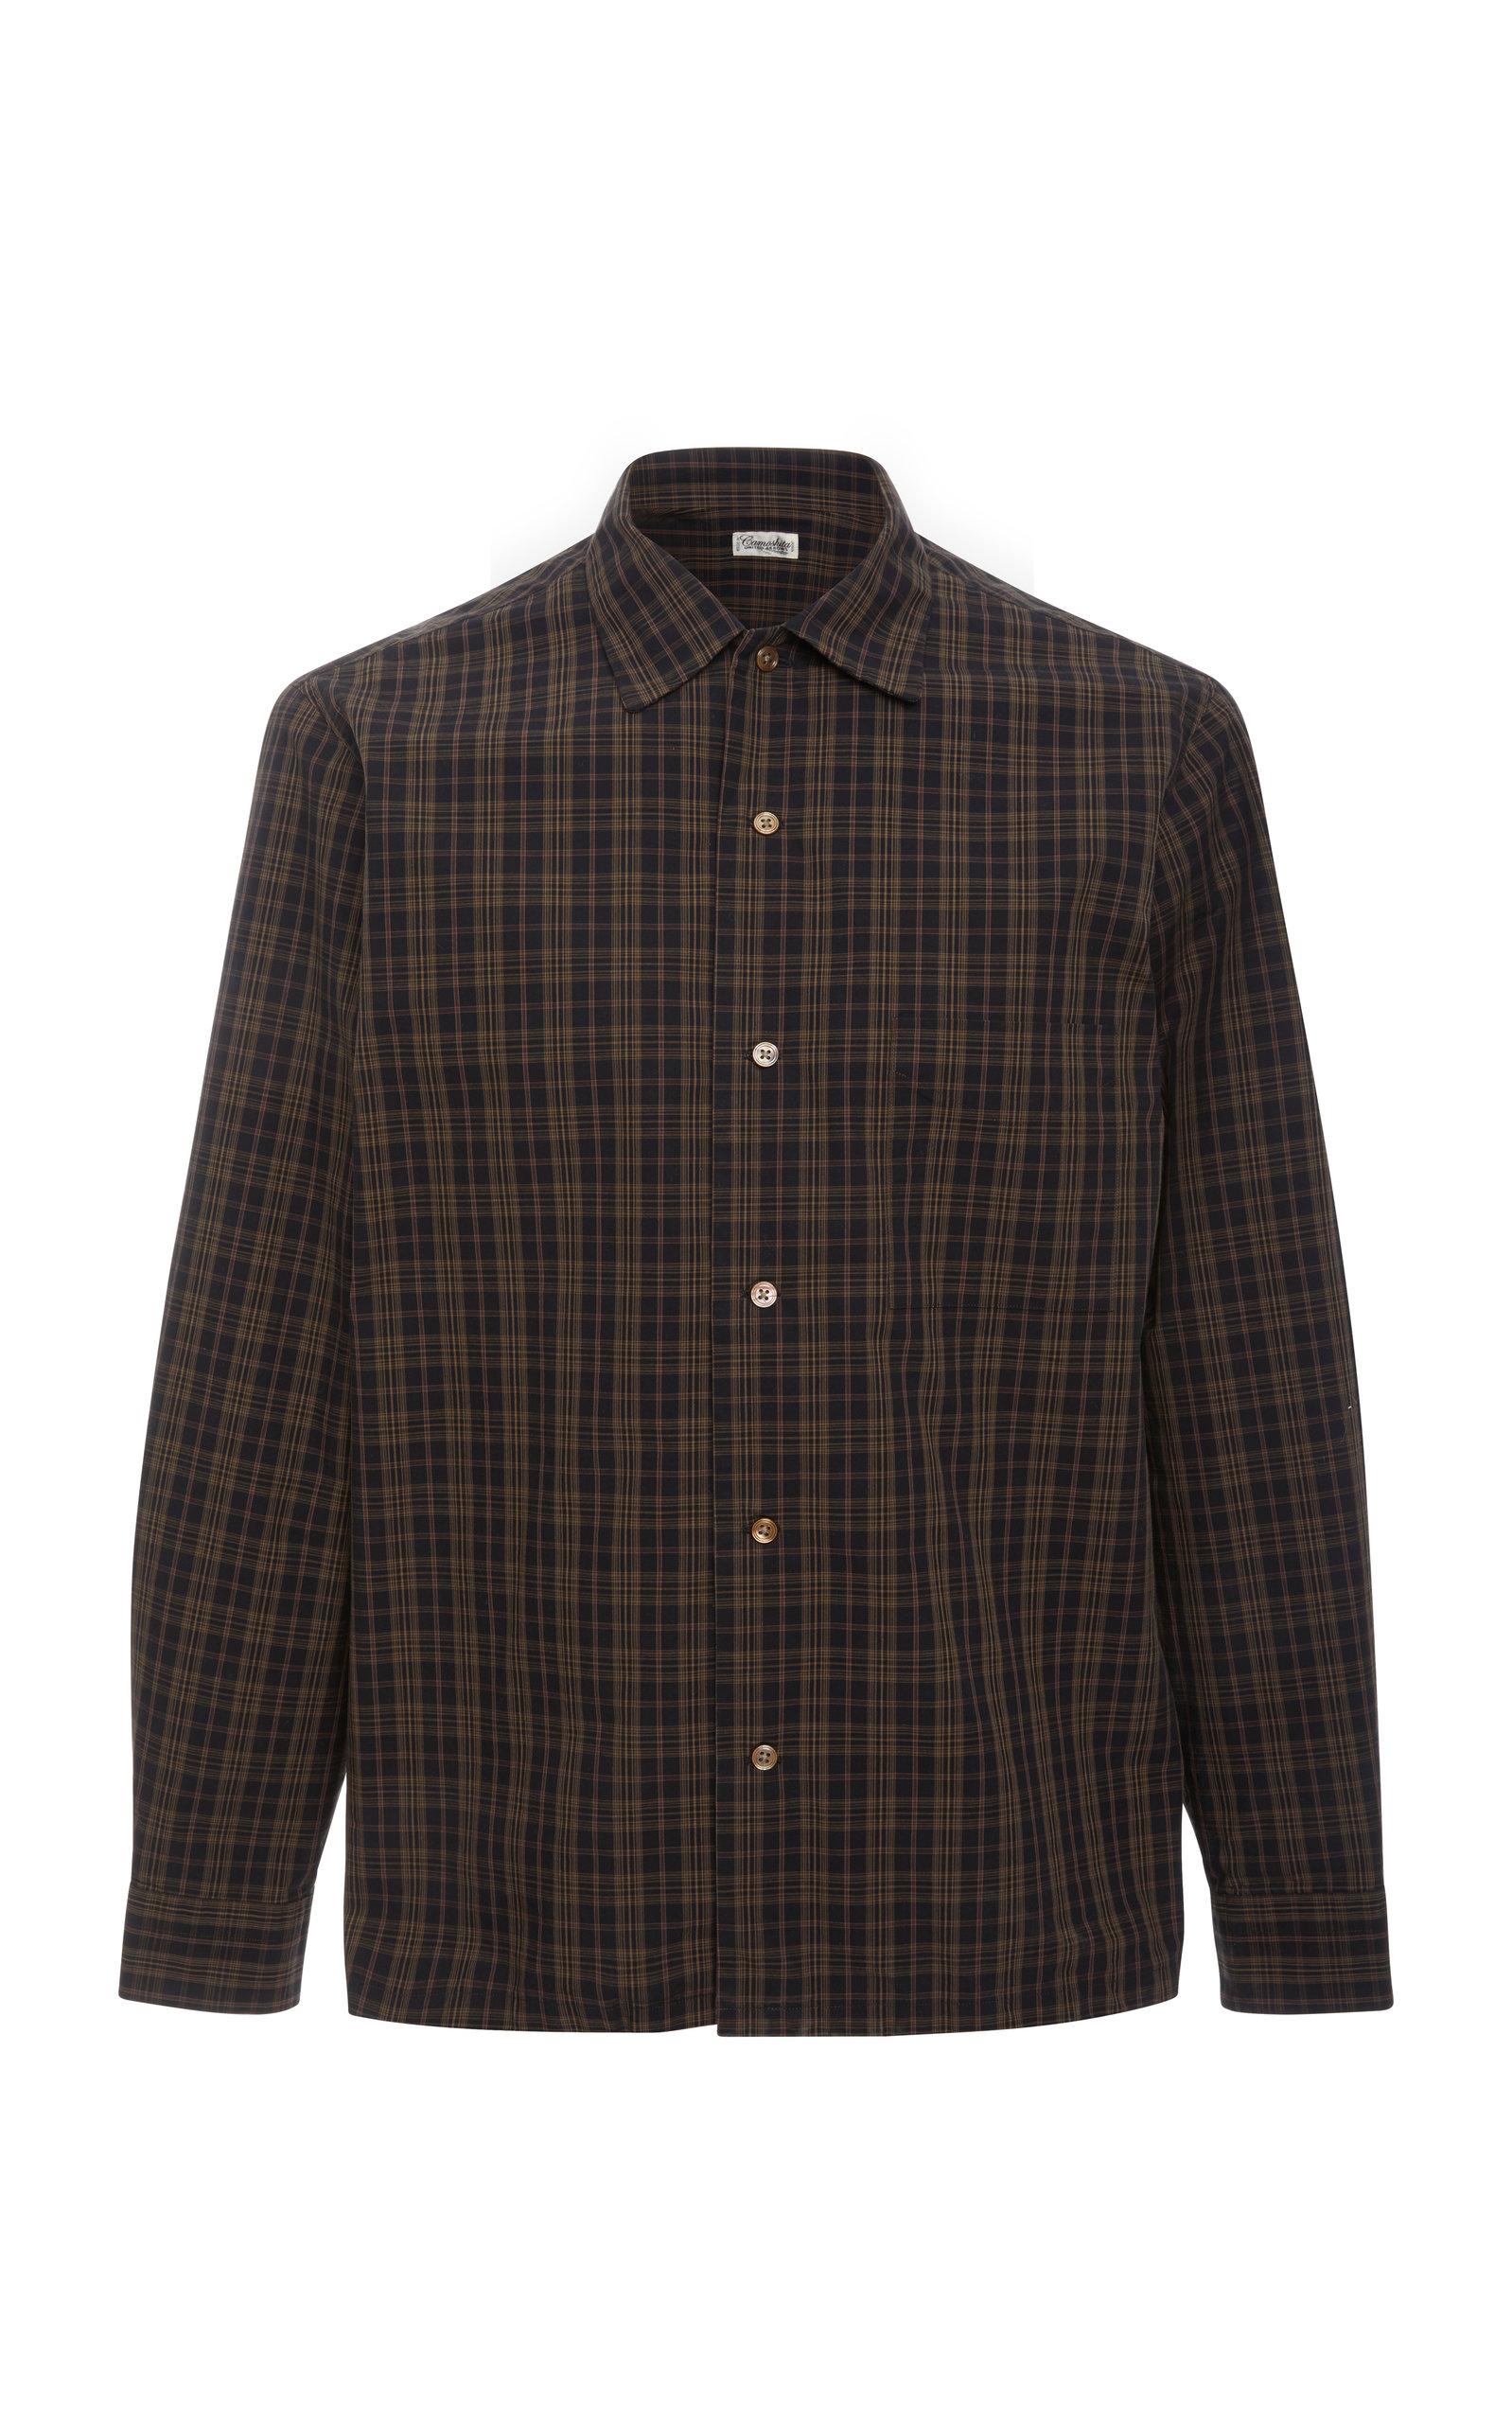 CAMOSHITA Collared Plaid Shirt